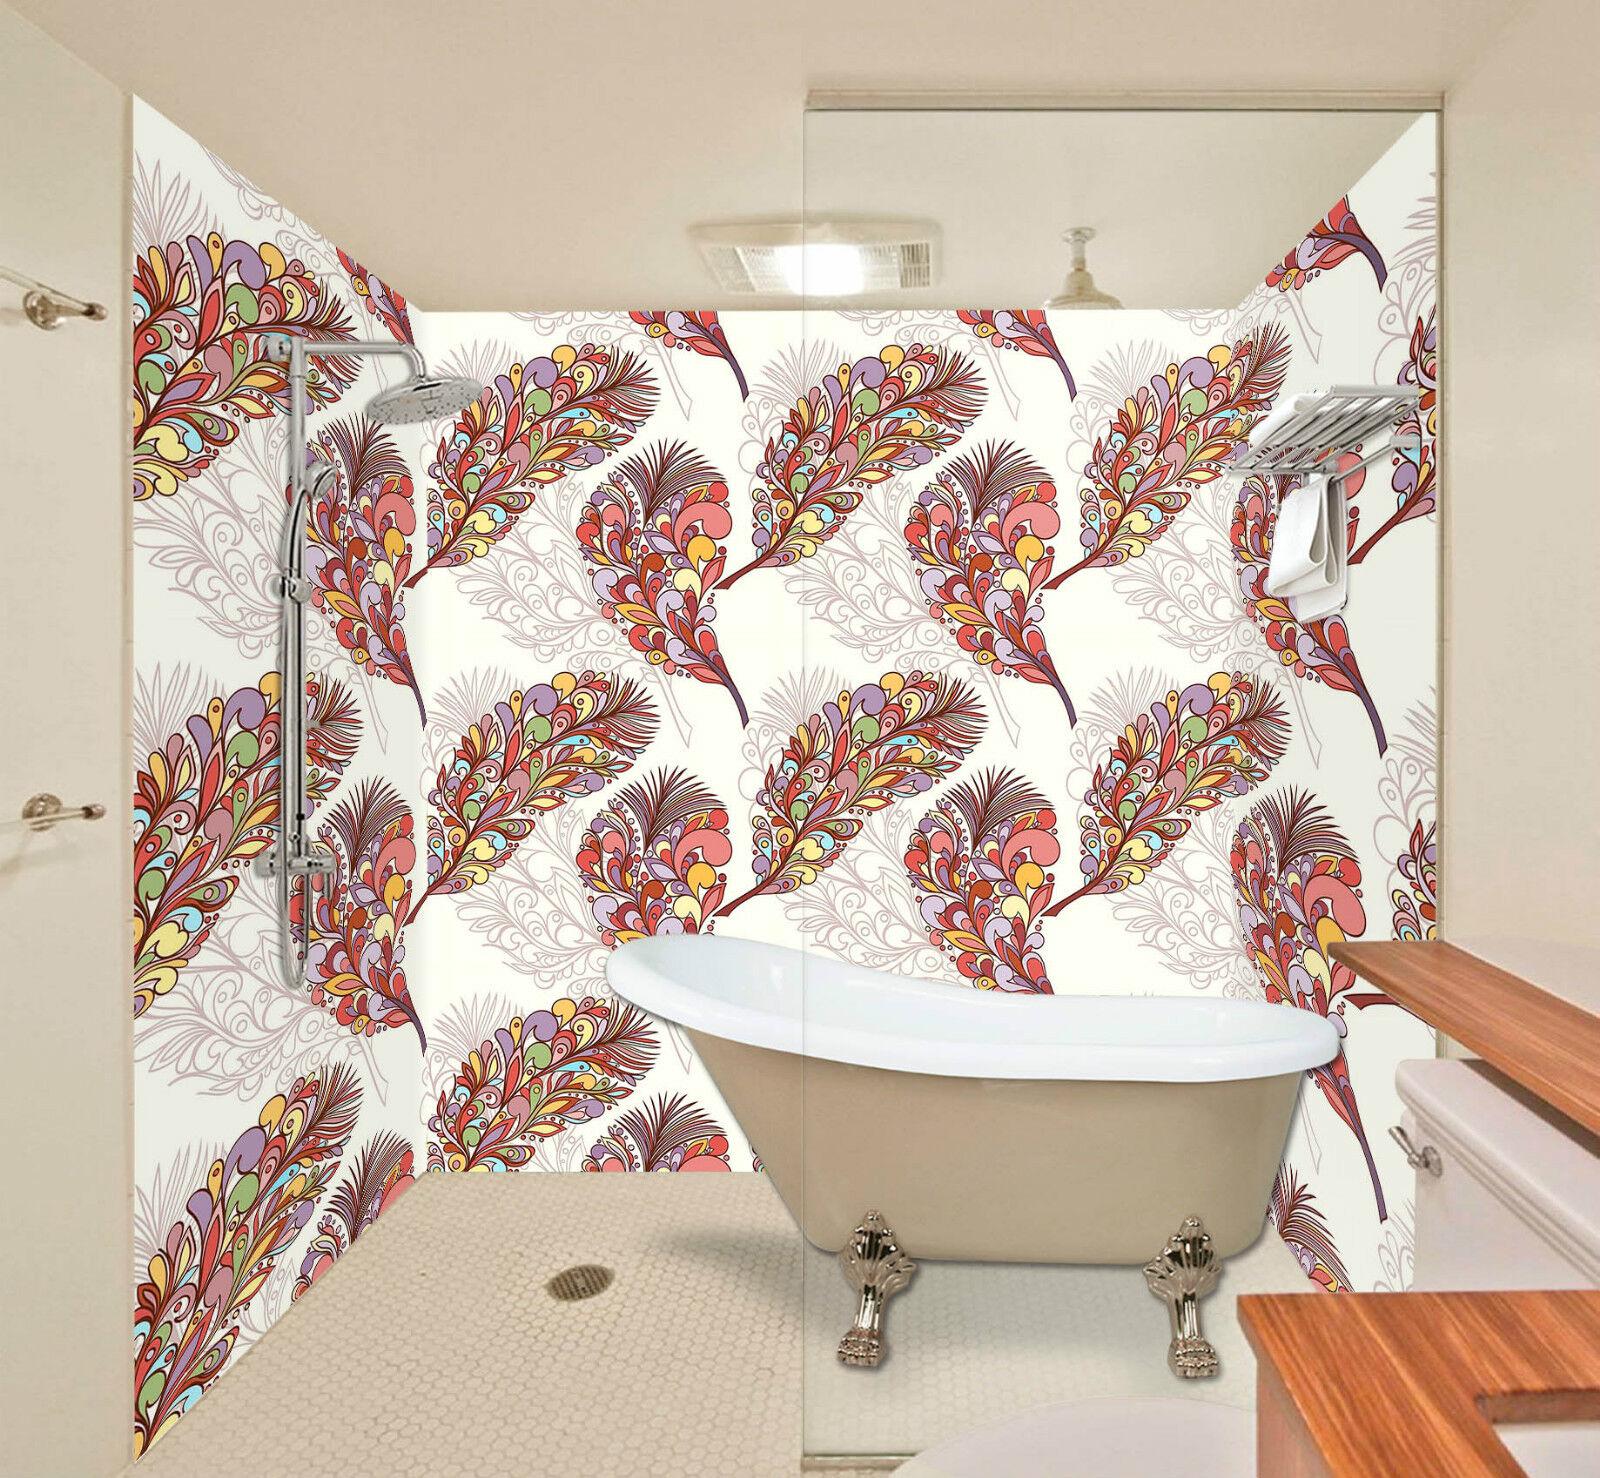 3D Farbe Feathers 128 WallPaper Bathroom Print Decal Wall Deco AJ WALLPAPER CA